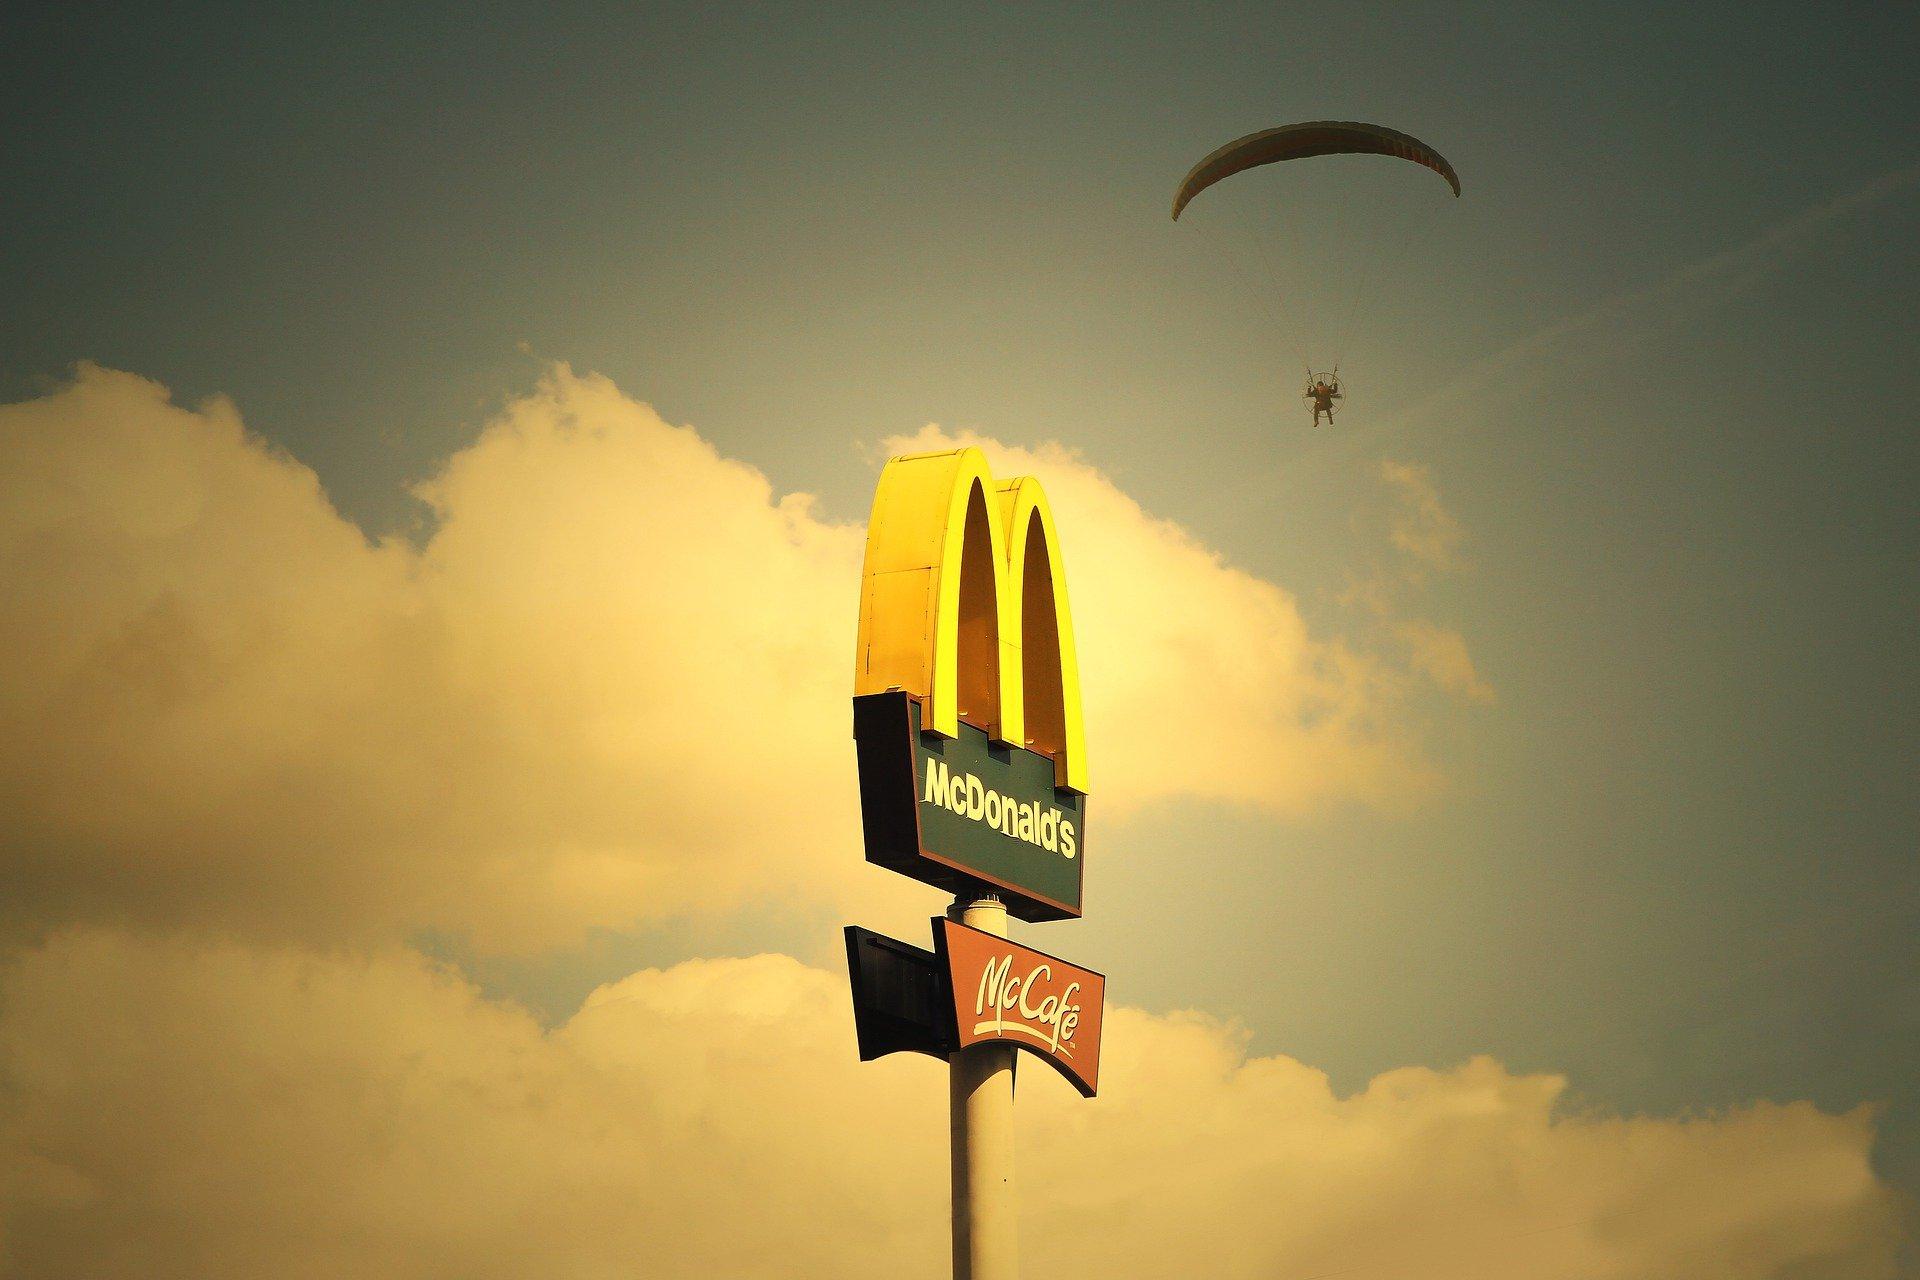 brak coca-coli w mcdonalds